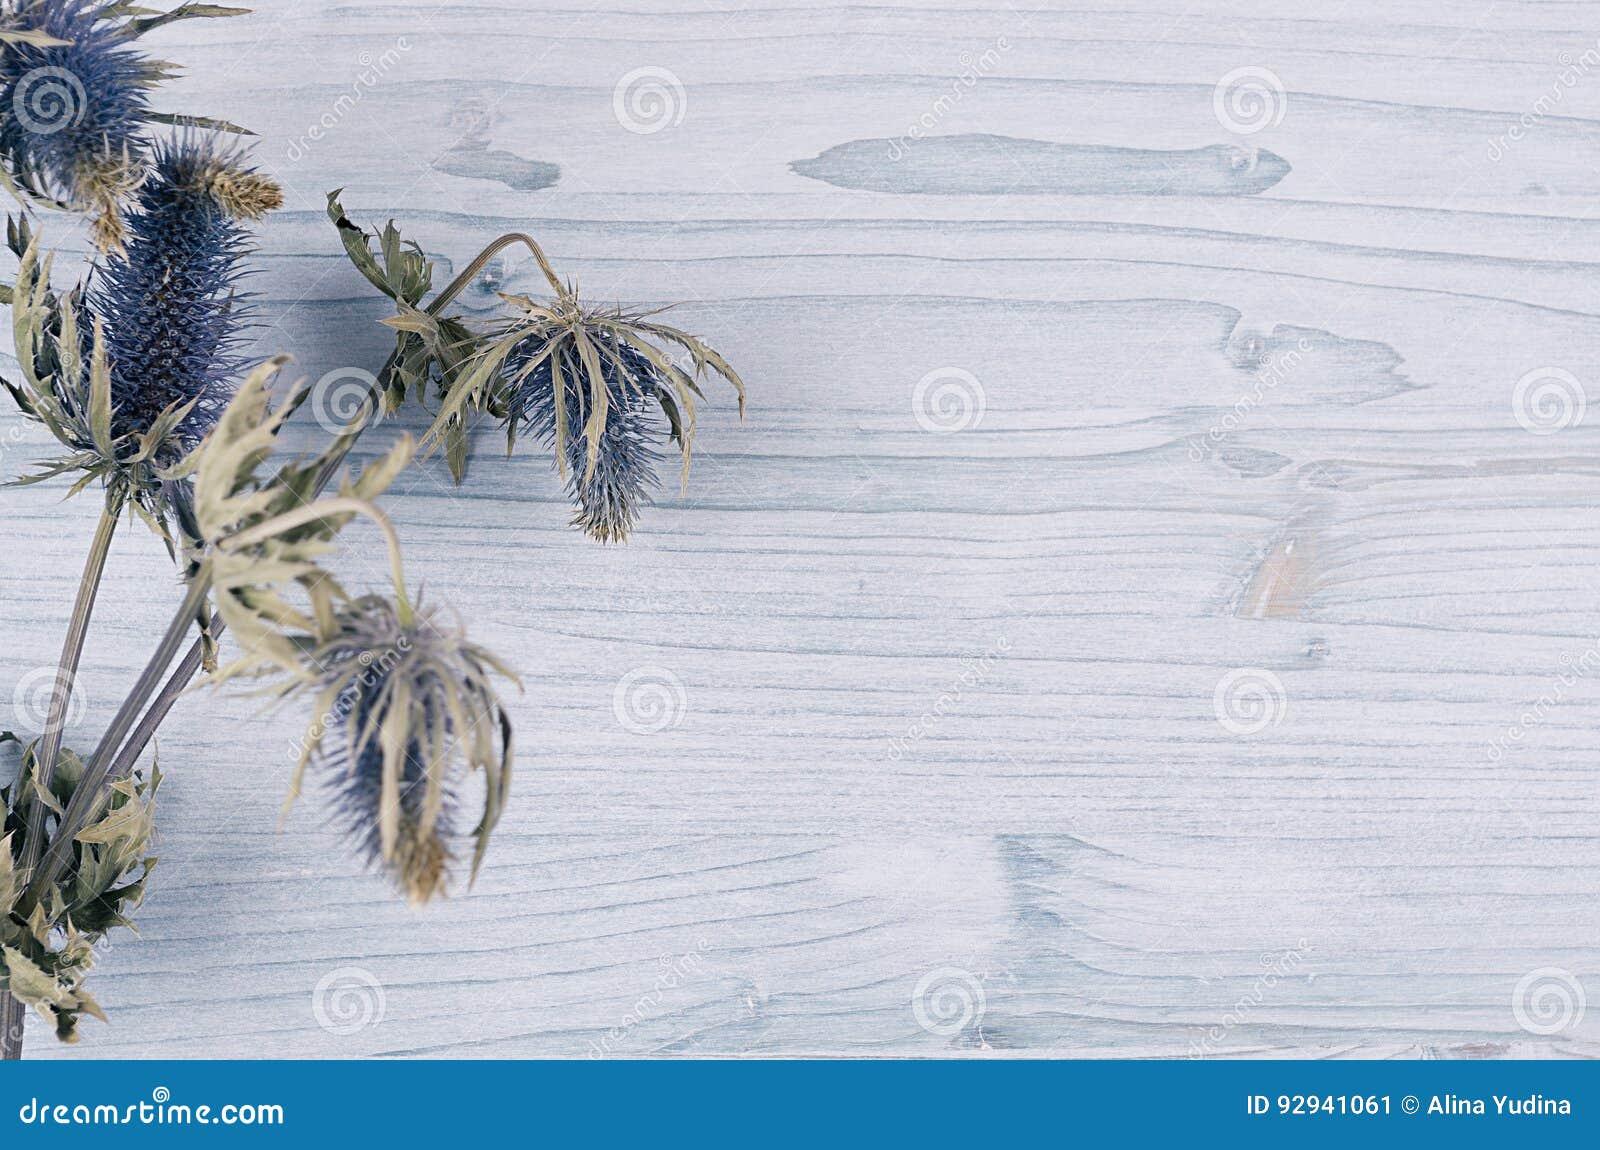 Dry Blue Flower On Light Soft Blue Wooden Board Decorative Spring